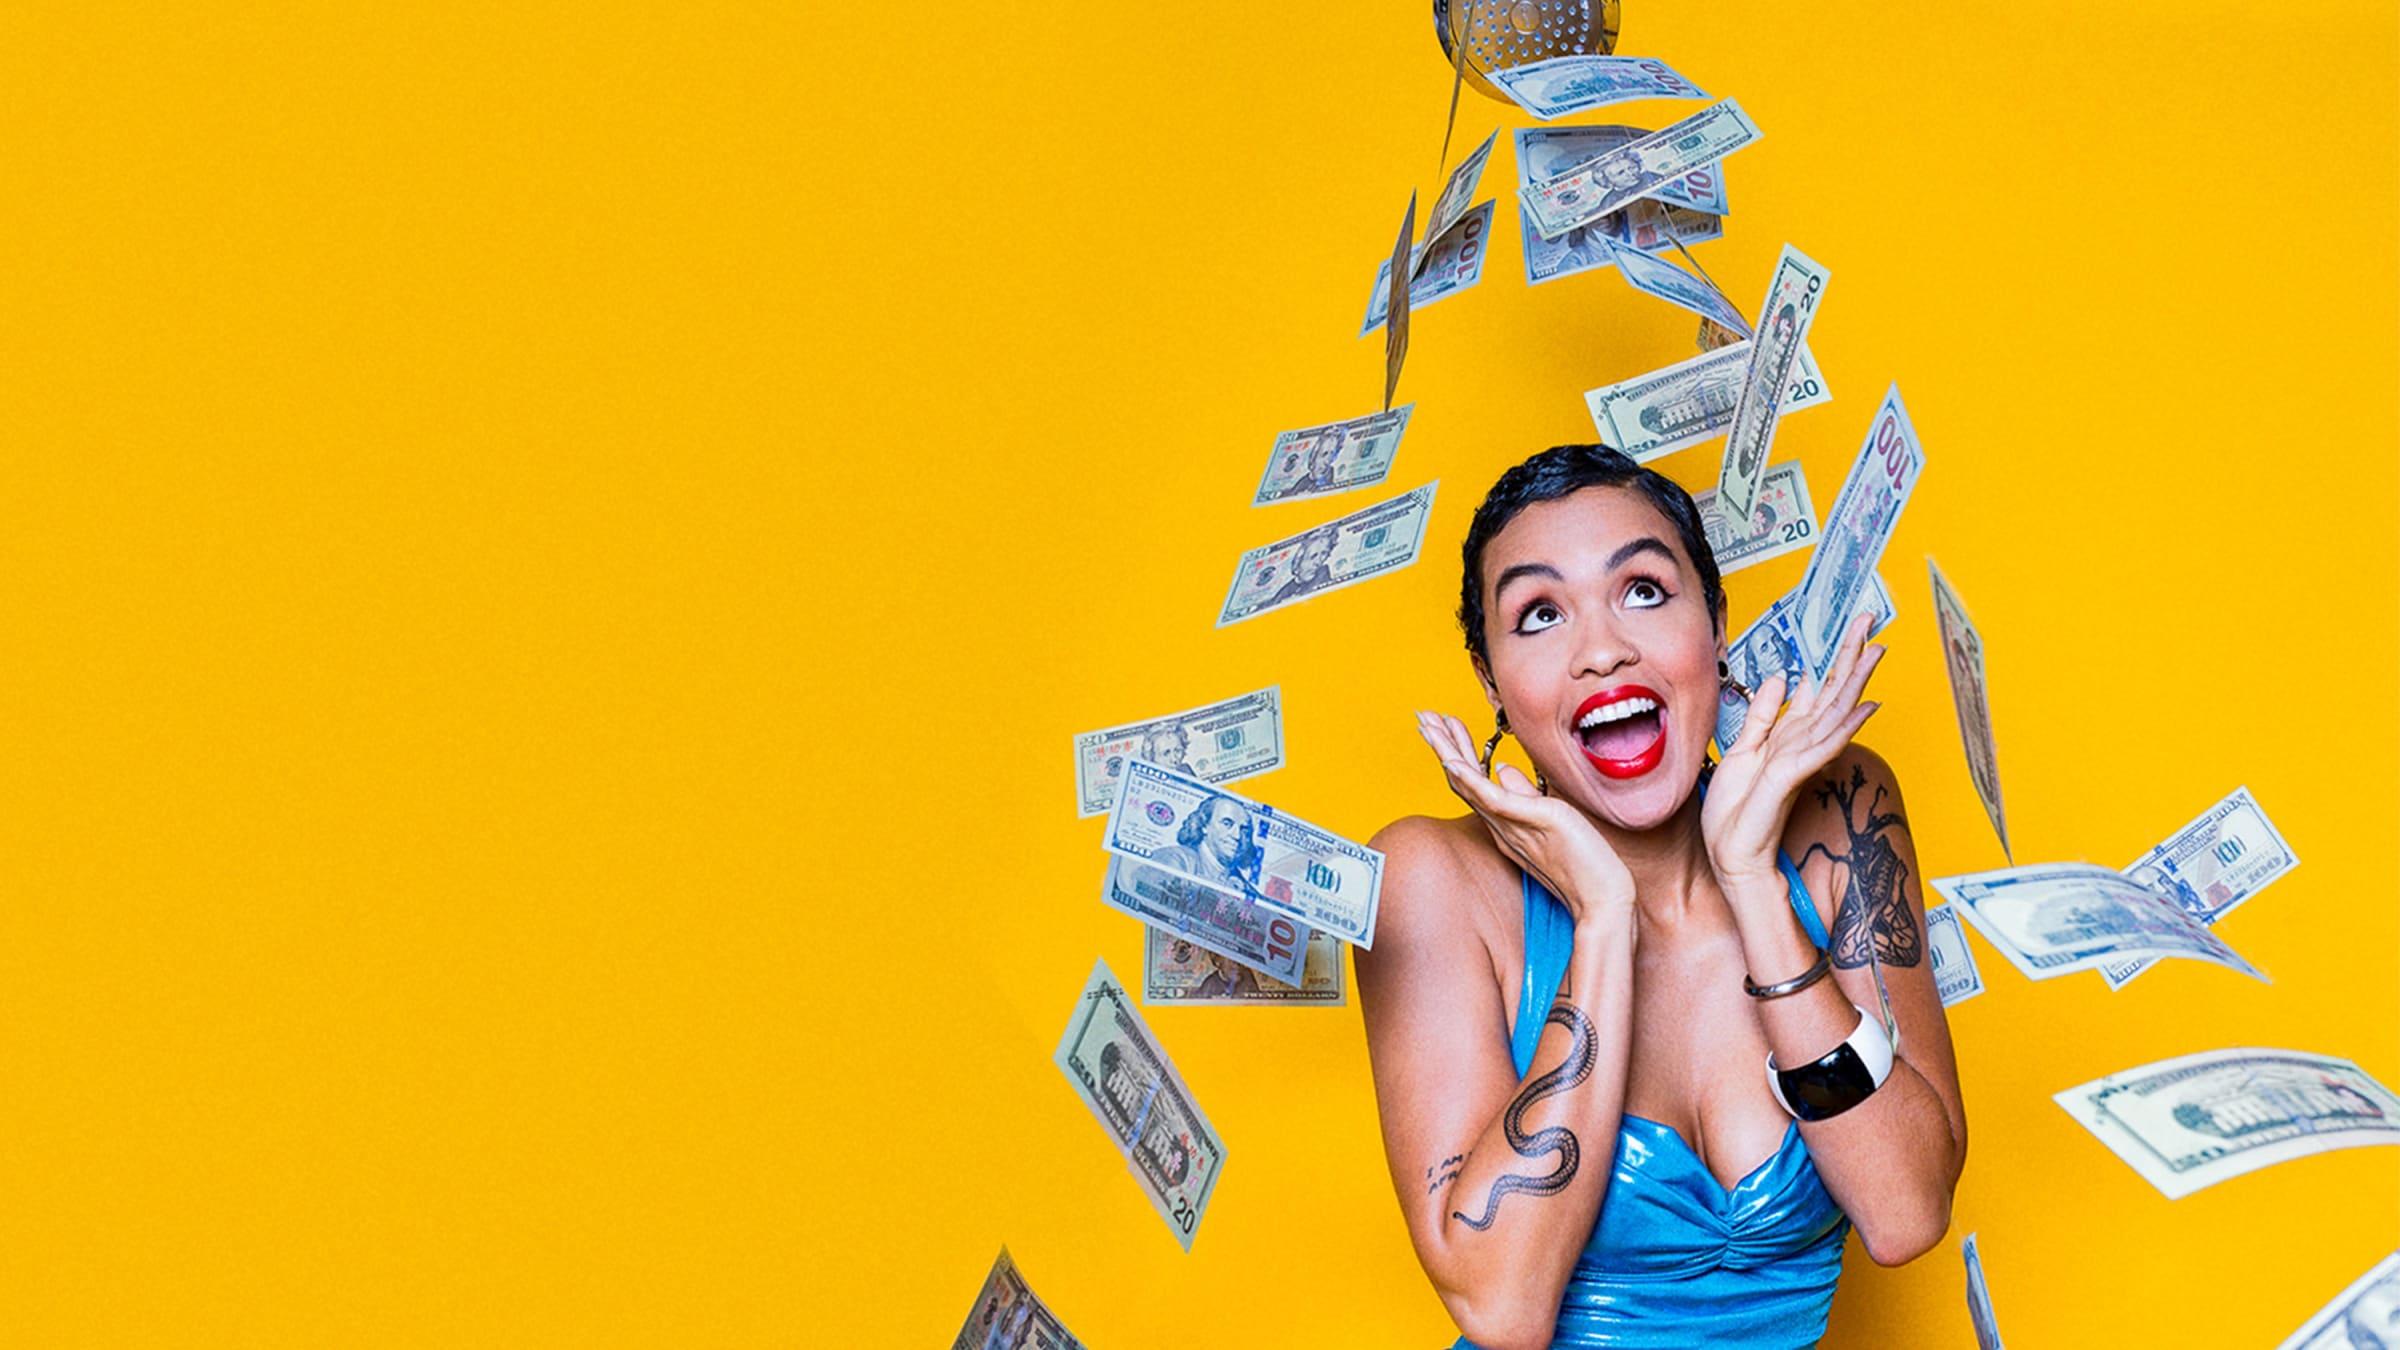 Inside Stacks House: The Terrible 'Feminist' Money Pop-Up Invading Los Angeles